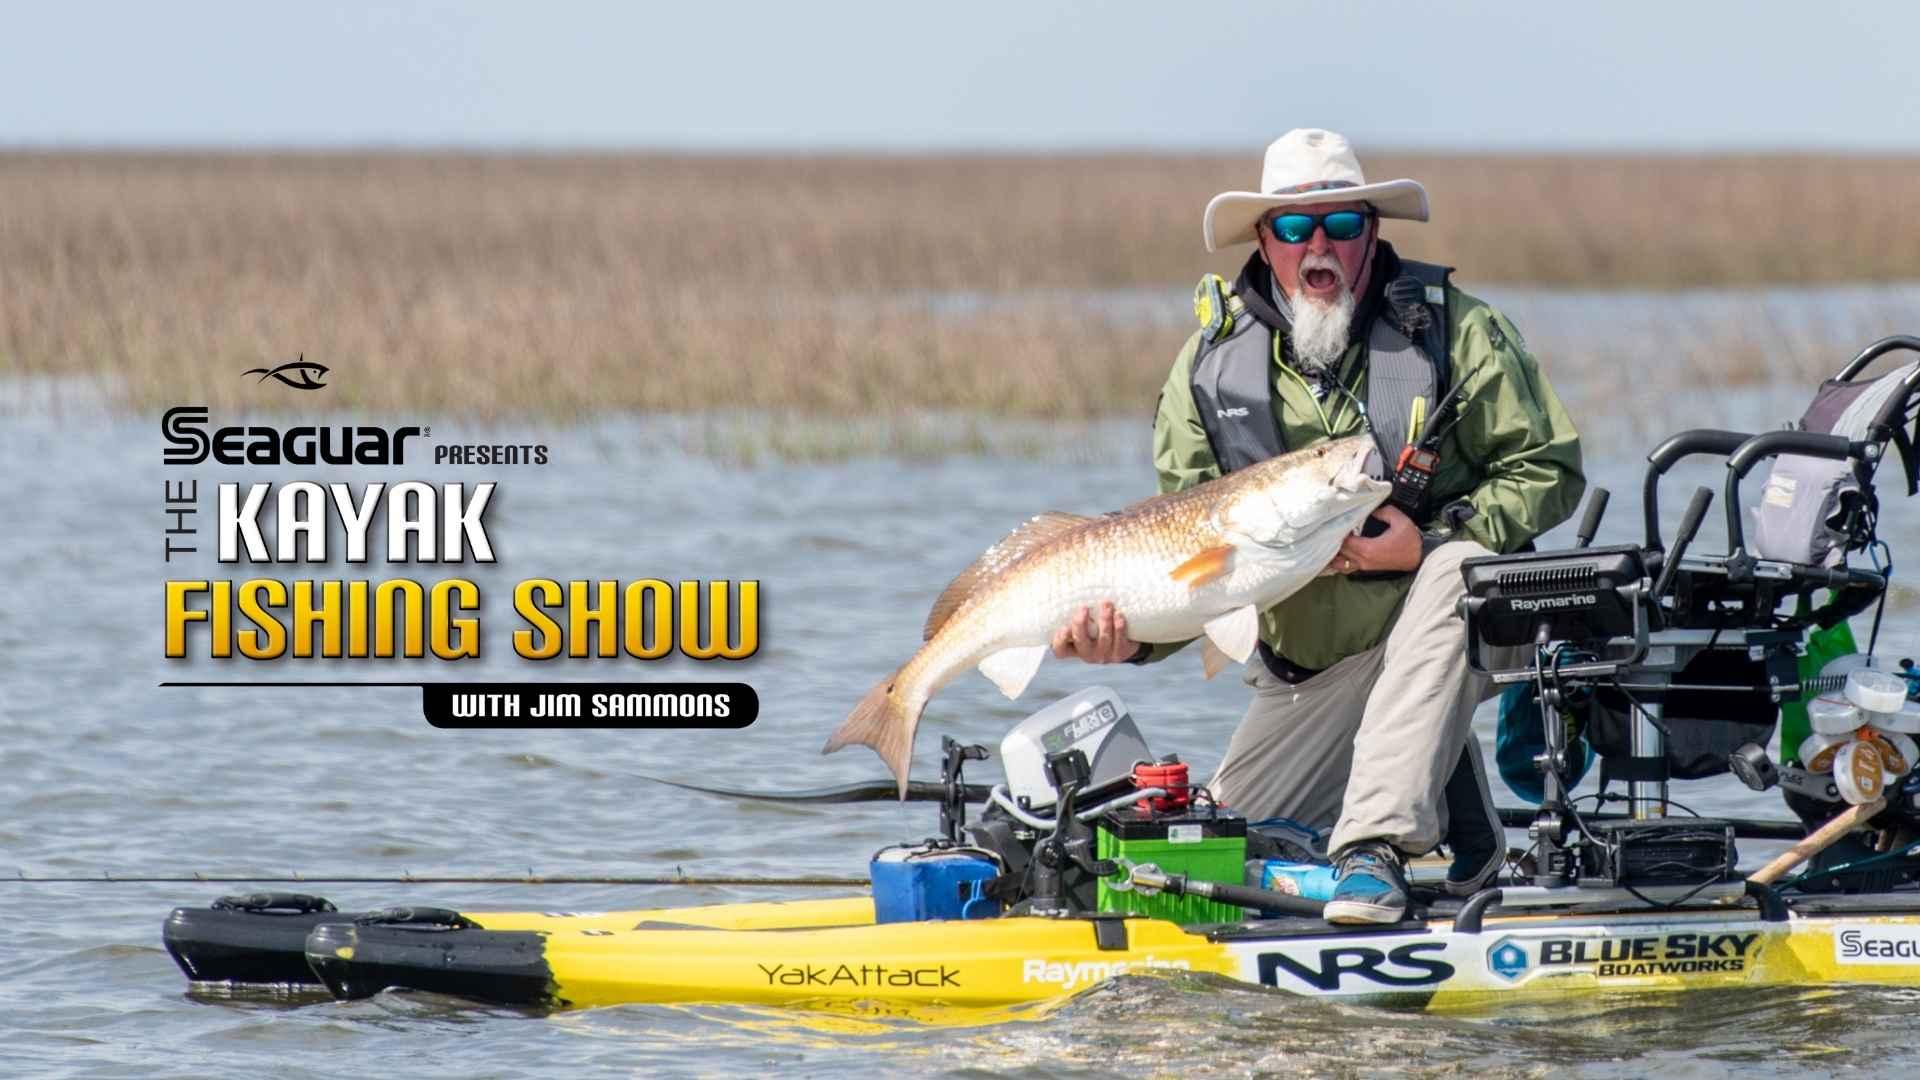 kayak fishing show season 12 premier banner with jim sammons